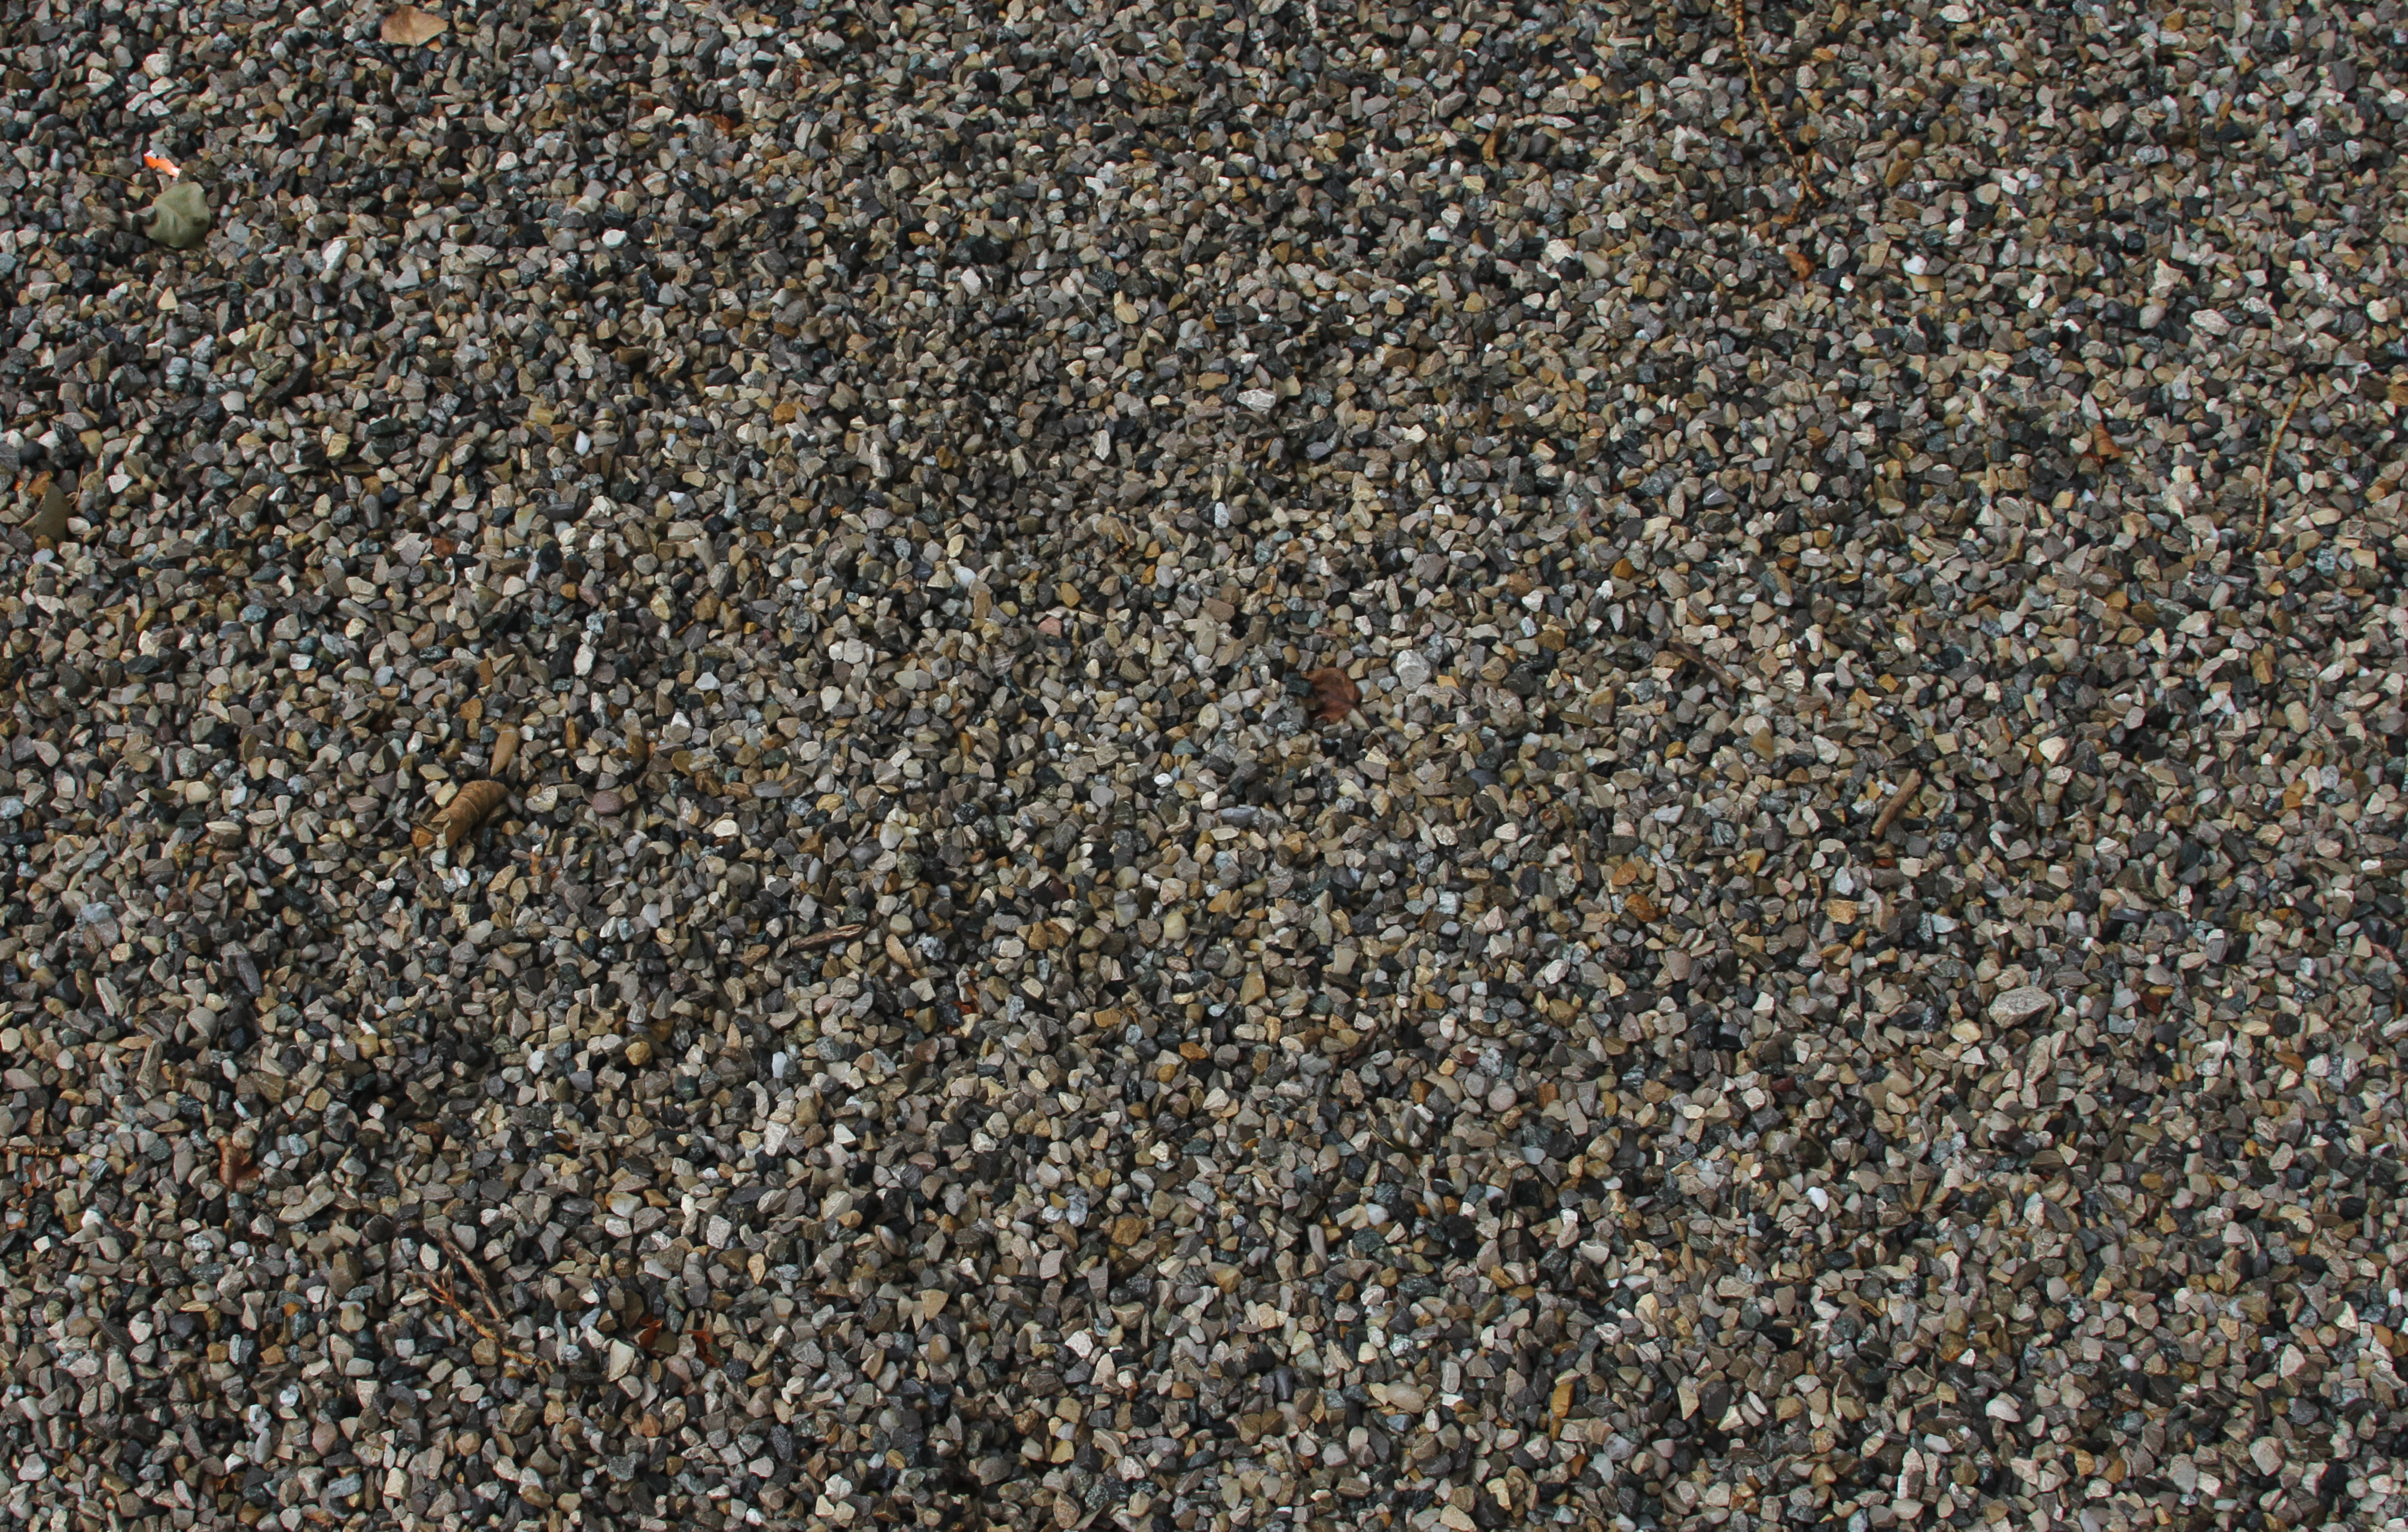 dark gravel texture - 14Textures